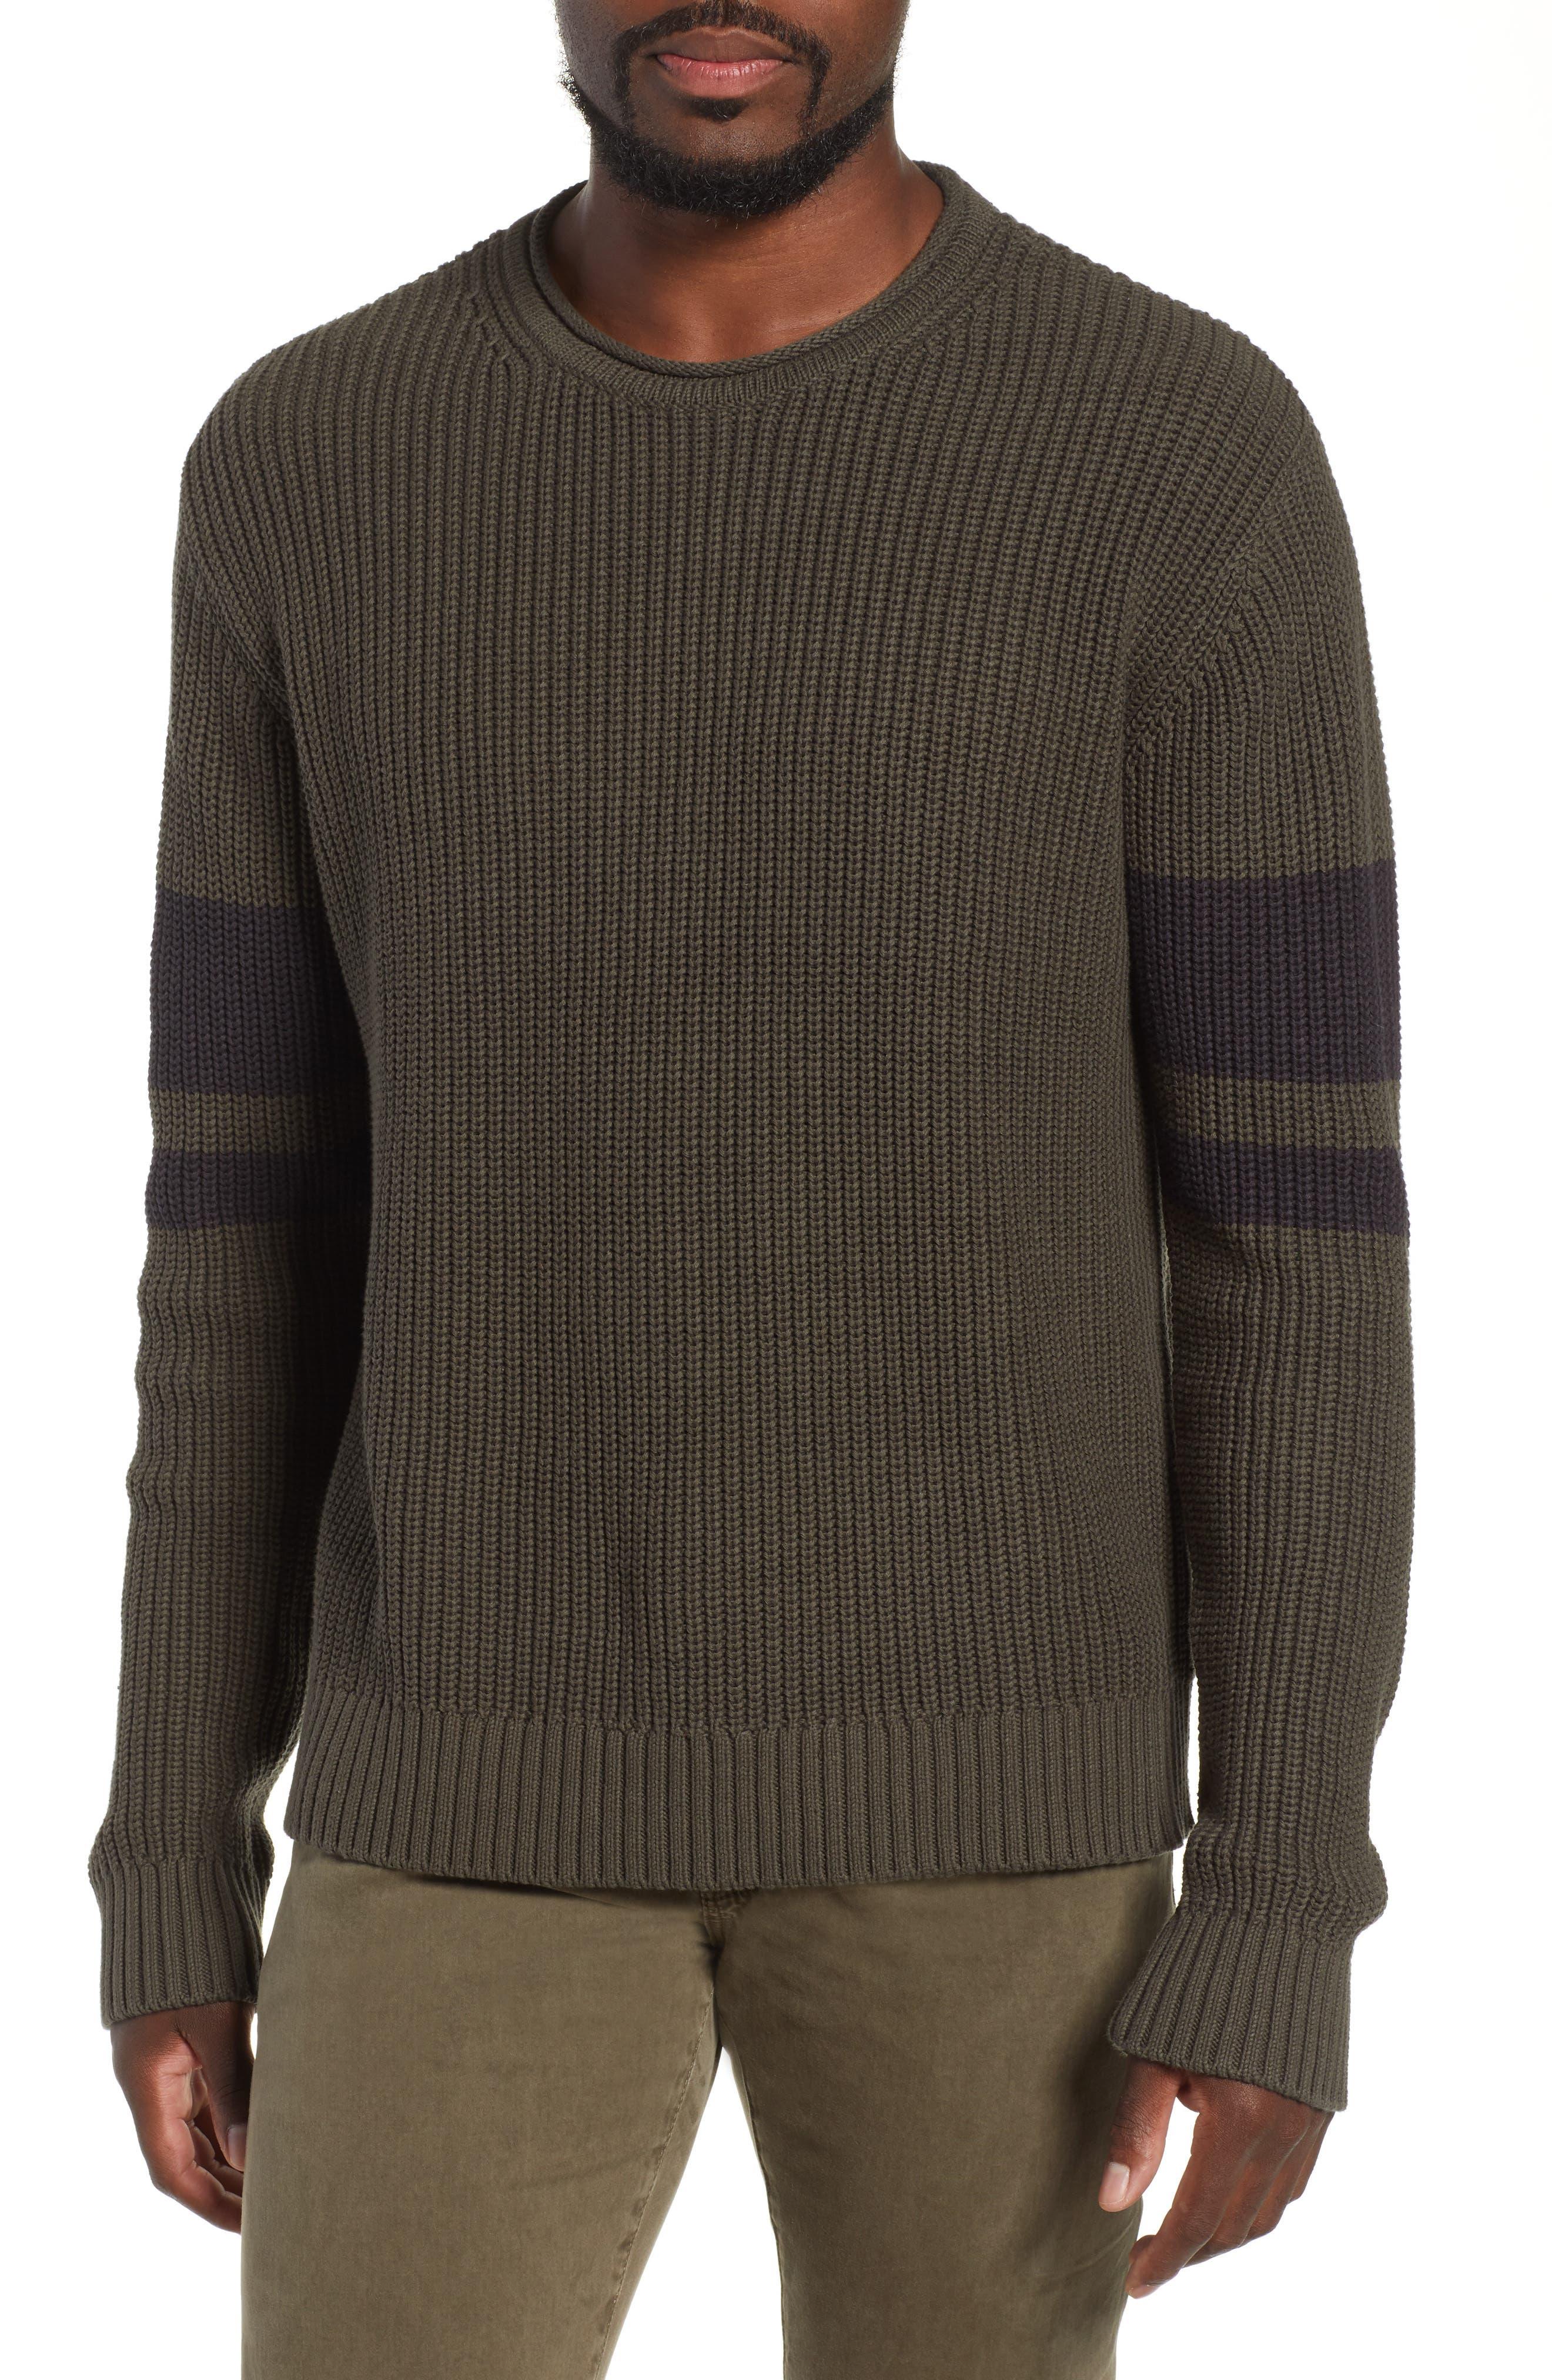 Jett Slim Fit Crewneck Sweater,                             Main thumbnail 1, color,                             OAK GROVE/ BLACK